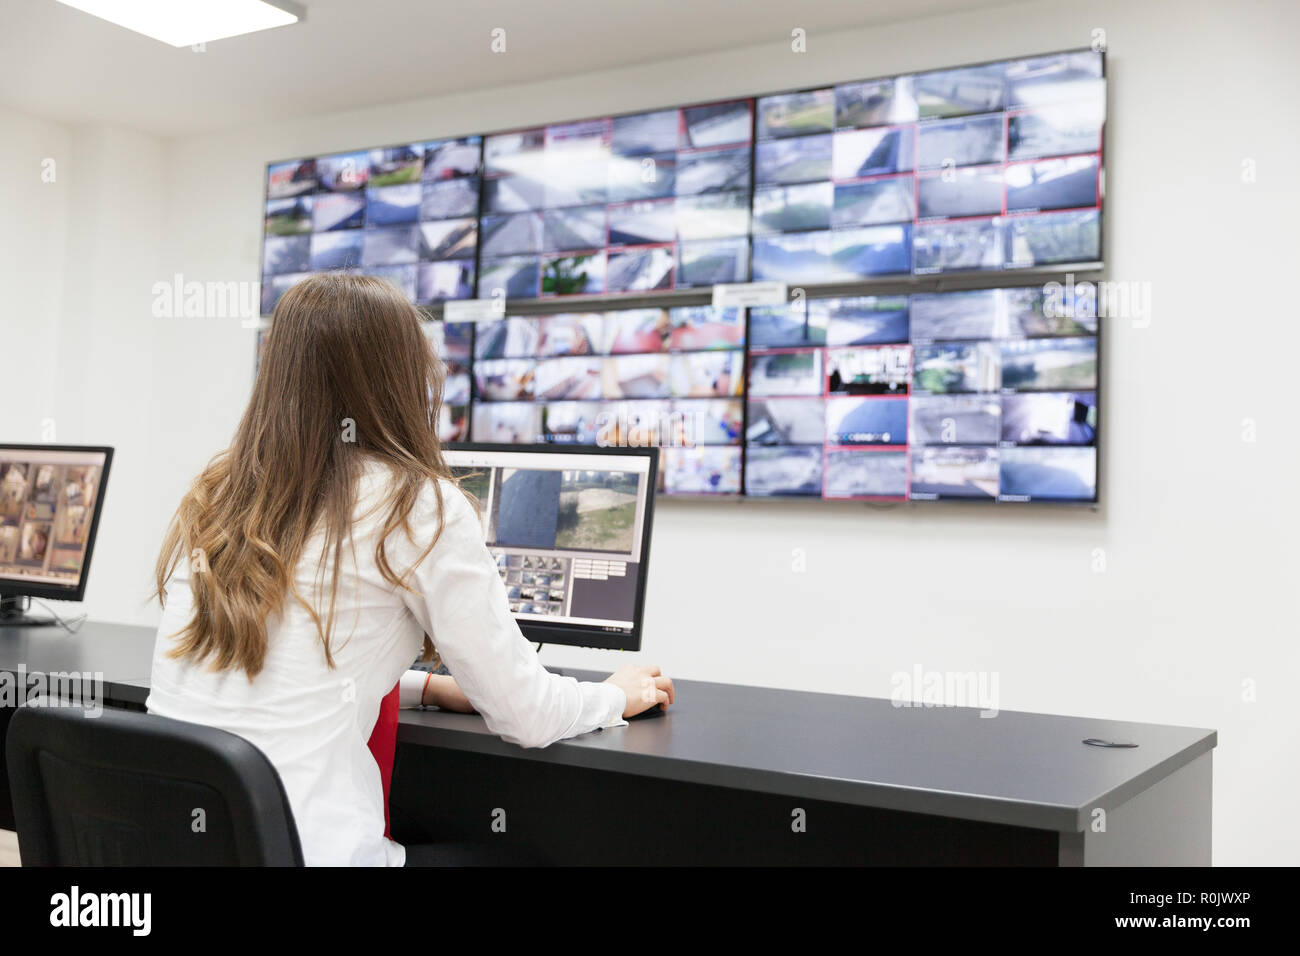 Security system operator. Security surveillance. - Stock Image